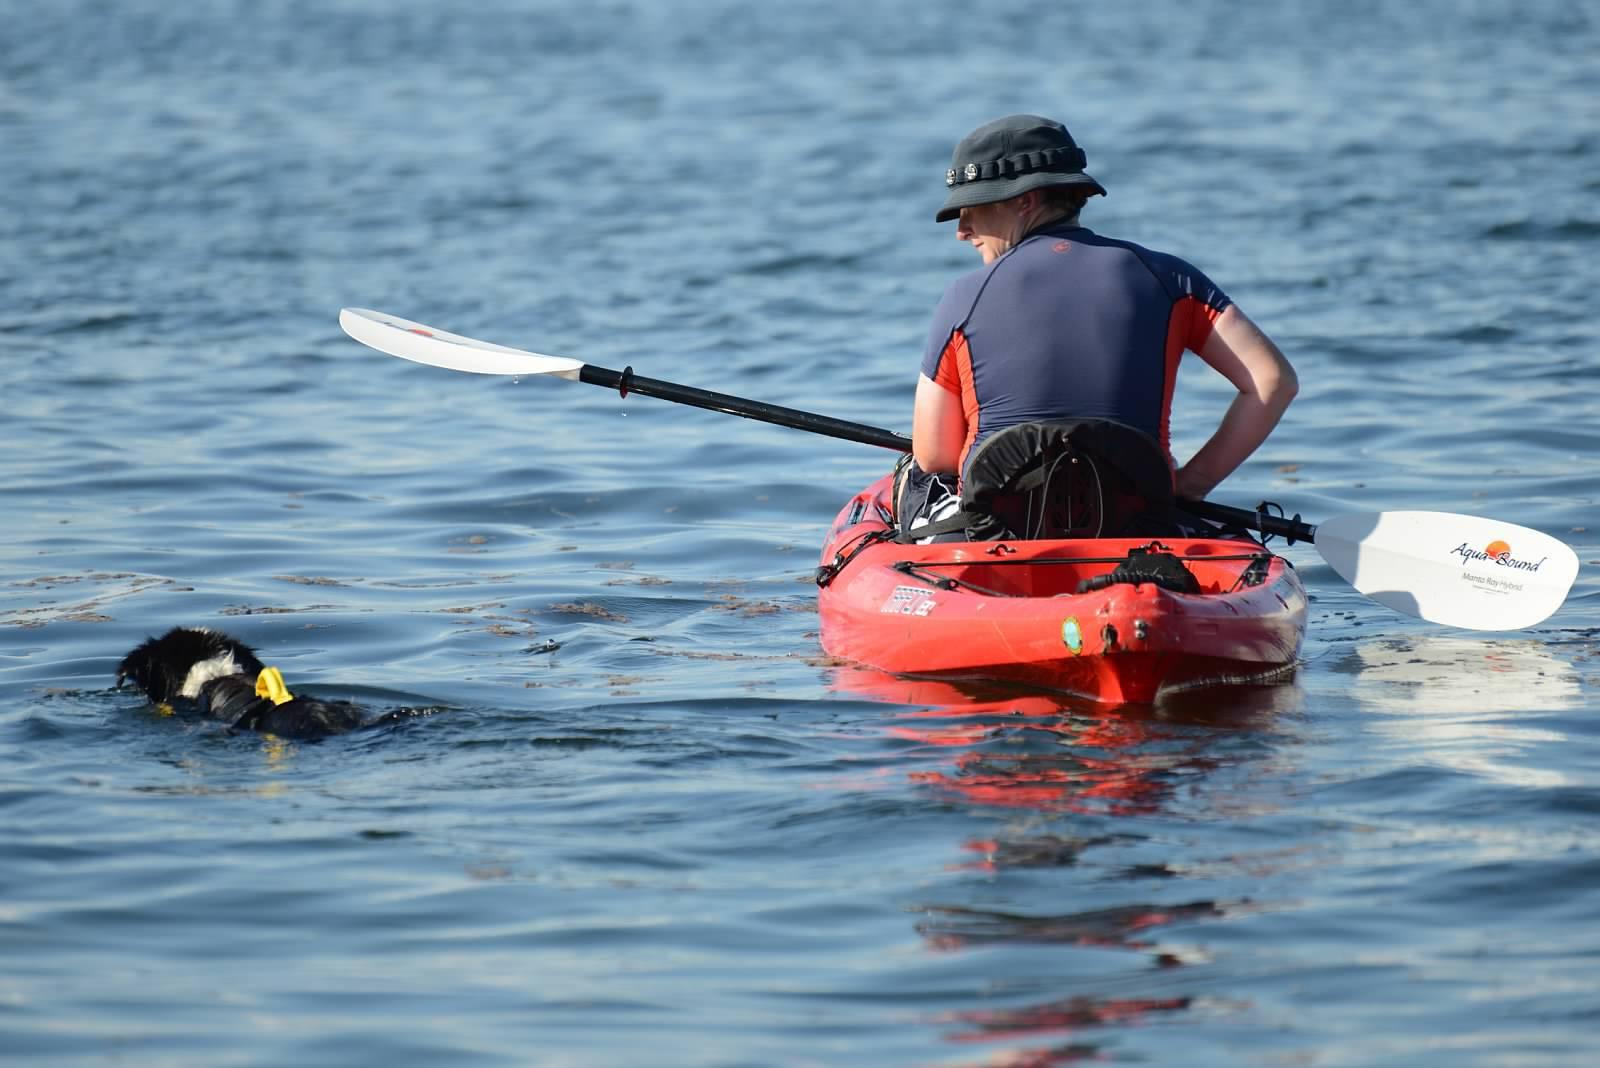 Kayaking with Fielder